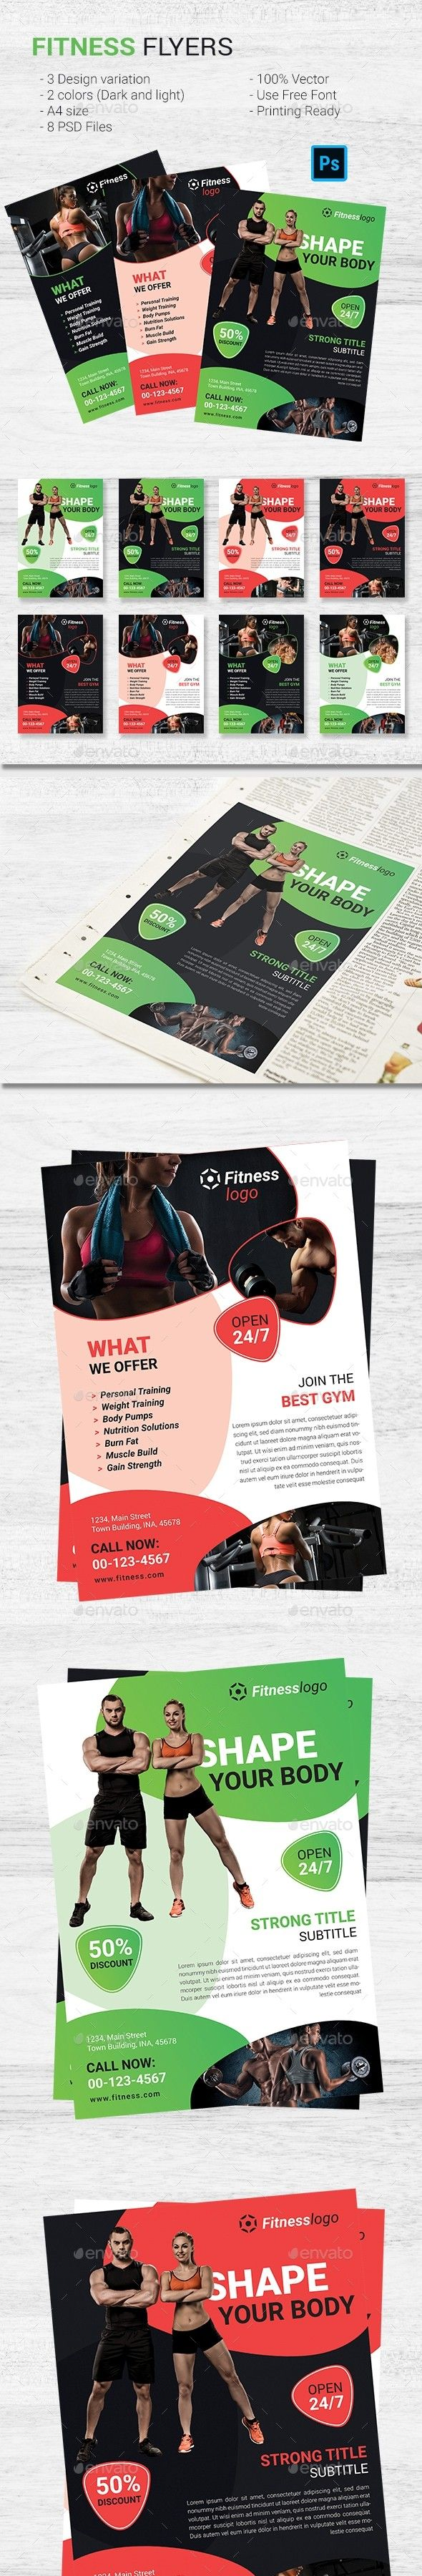 Advertising Aerobic Beauty Body Builng Bodycombat Bodypump Cardio Design